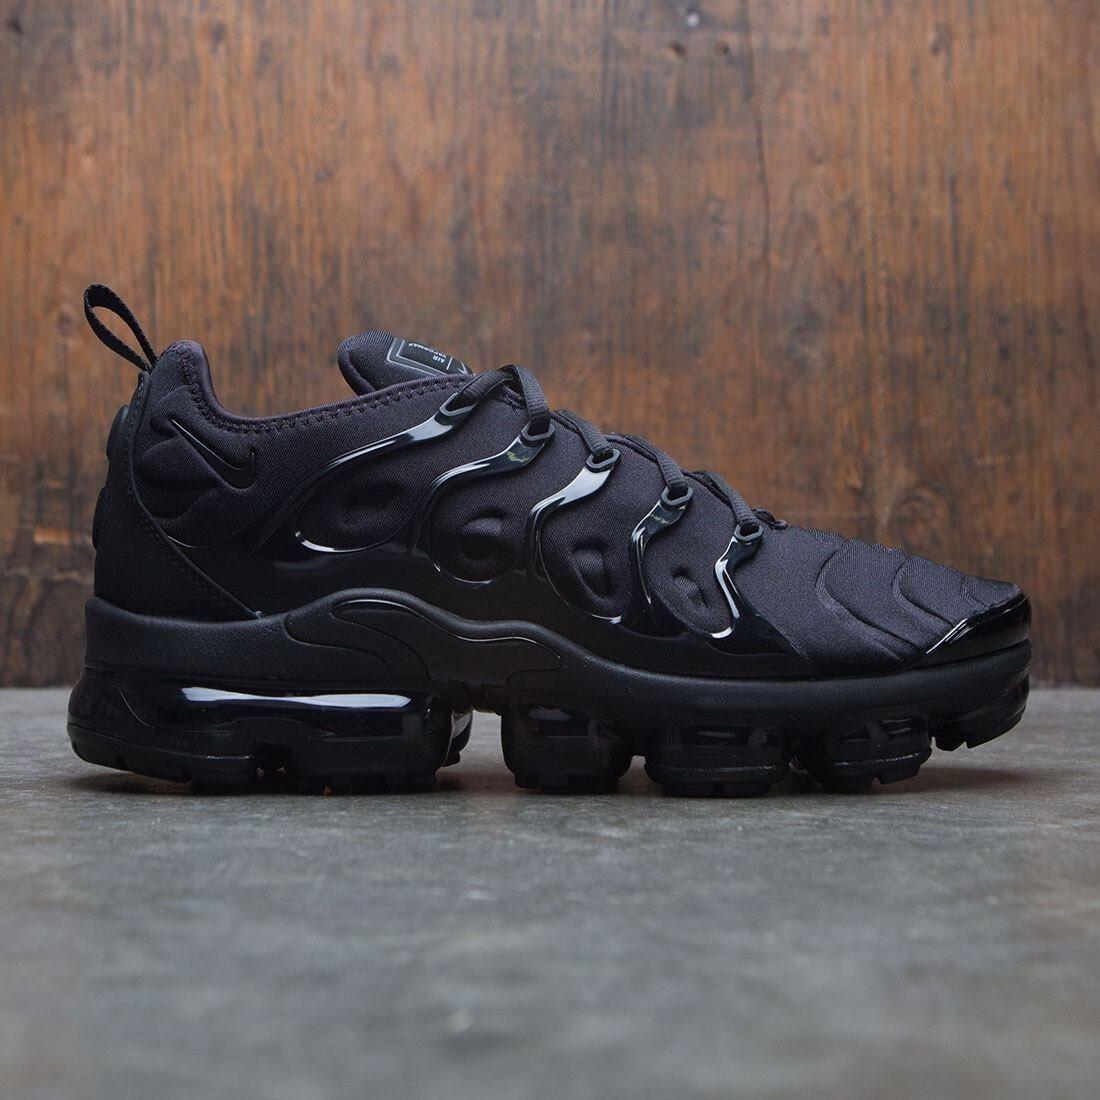 165d1e759b2 Nike Air Plus Triple Black Size 9.5. 924453-004 95 97 98 1 Vapormax  nefuxb7871-Athletic Shoes